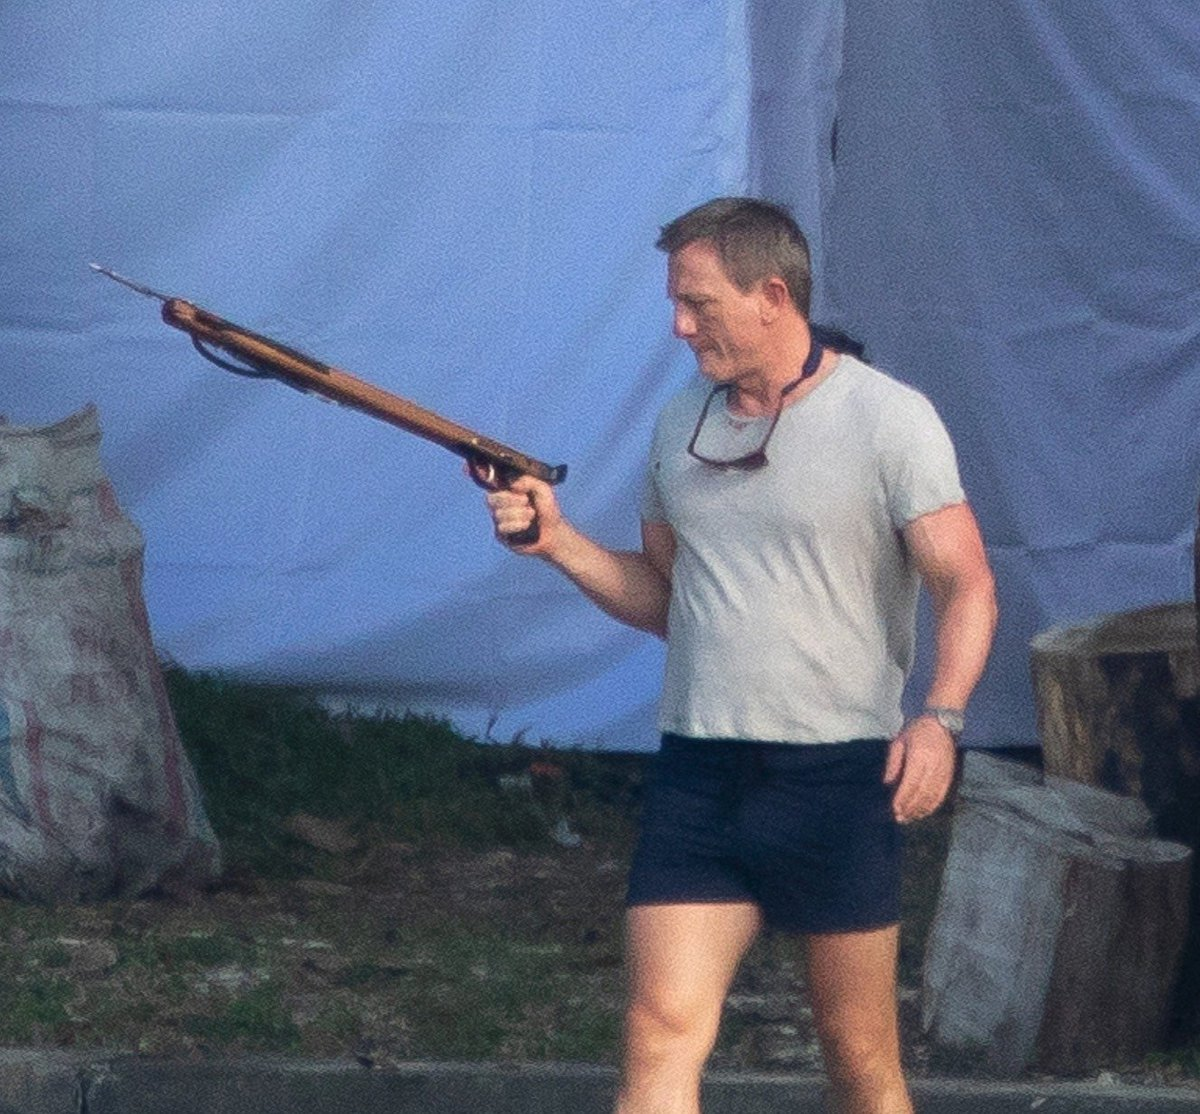 S harpunou to Daniel Craig umí.